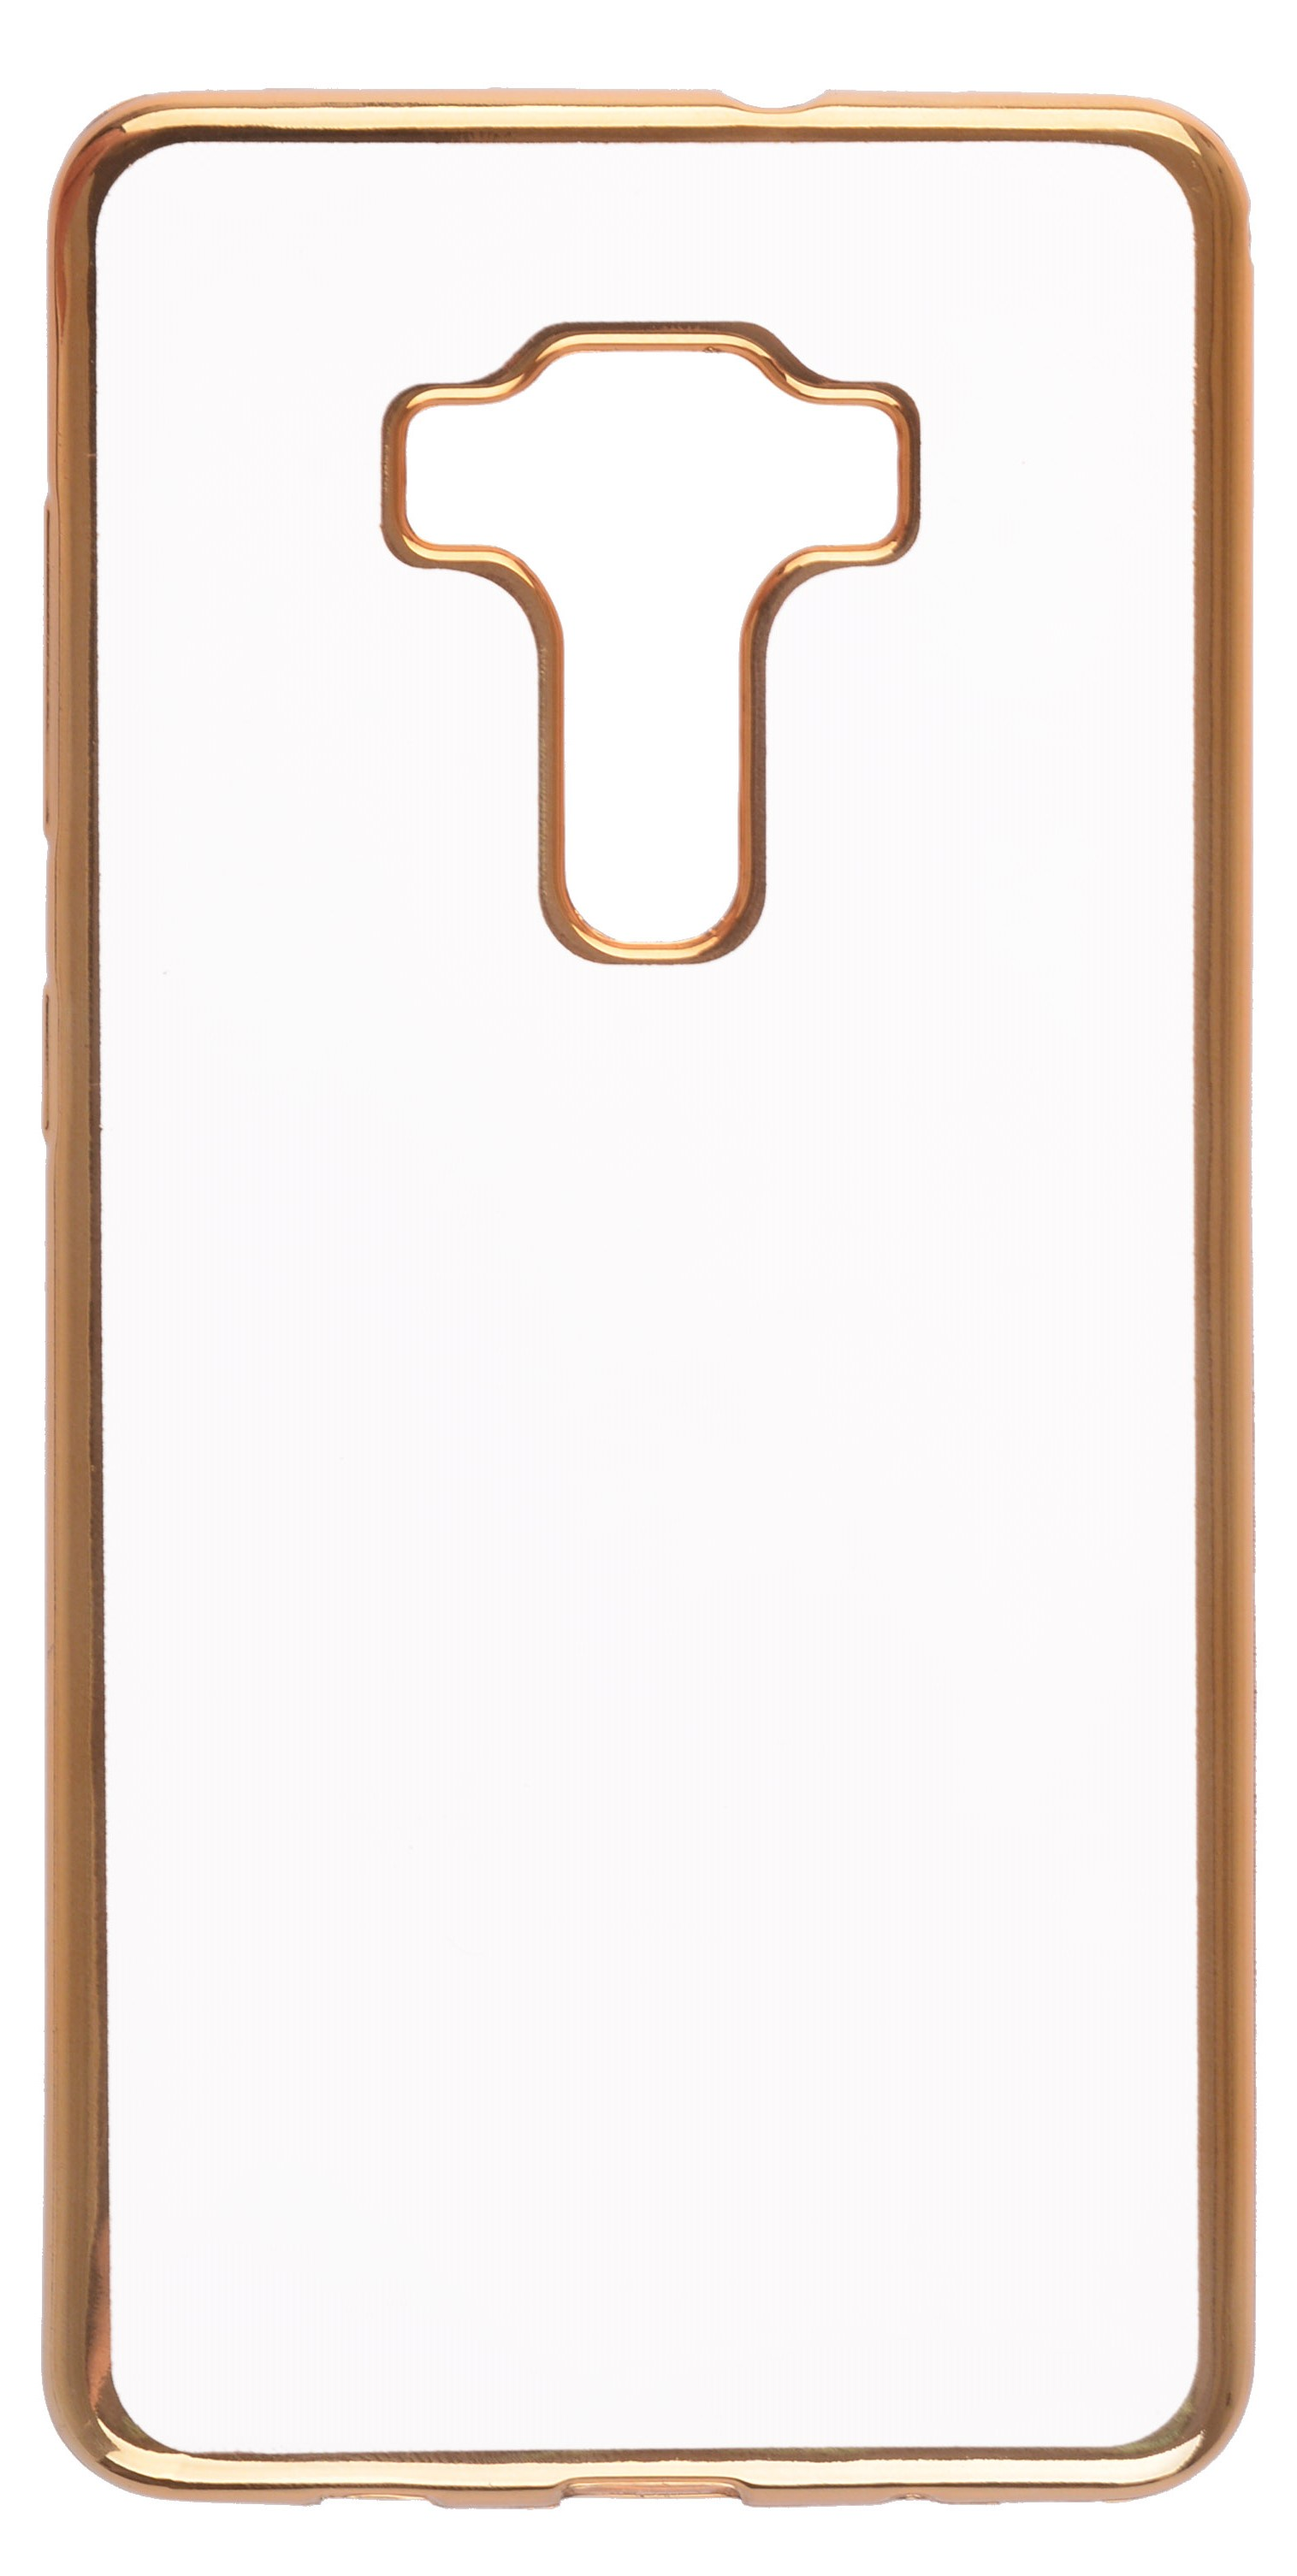 Чехол для сотового телефона skinBOX Silicone chrome border, 4630042524682, золотой аксессуар чехол накладка innovation silicone 0 33mm для apple iphone 5 5s transparent 12001